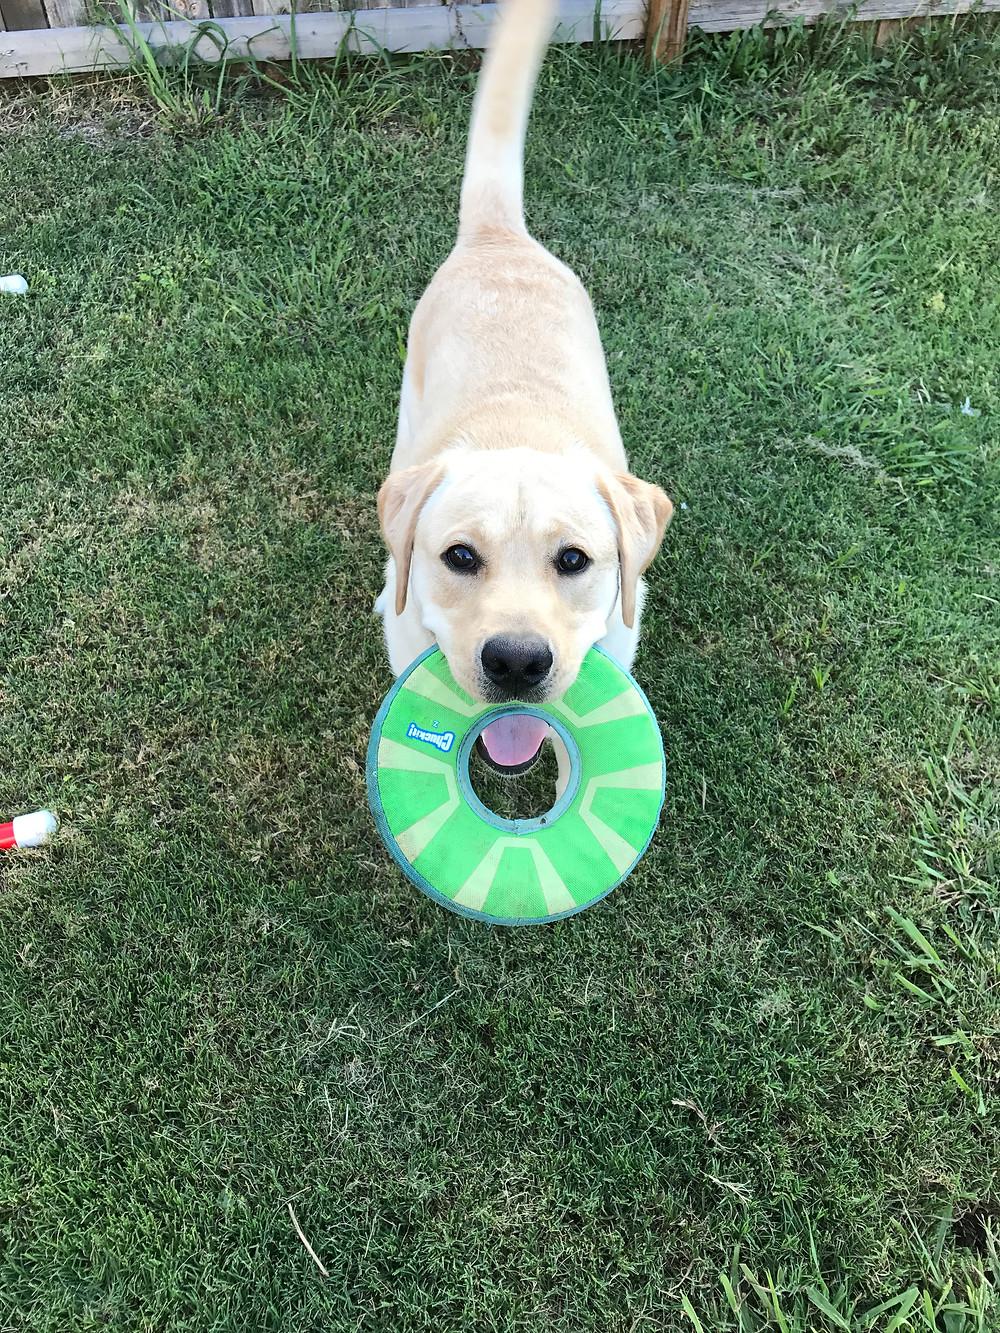 Luke holding the CHUCKIT frisbee